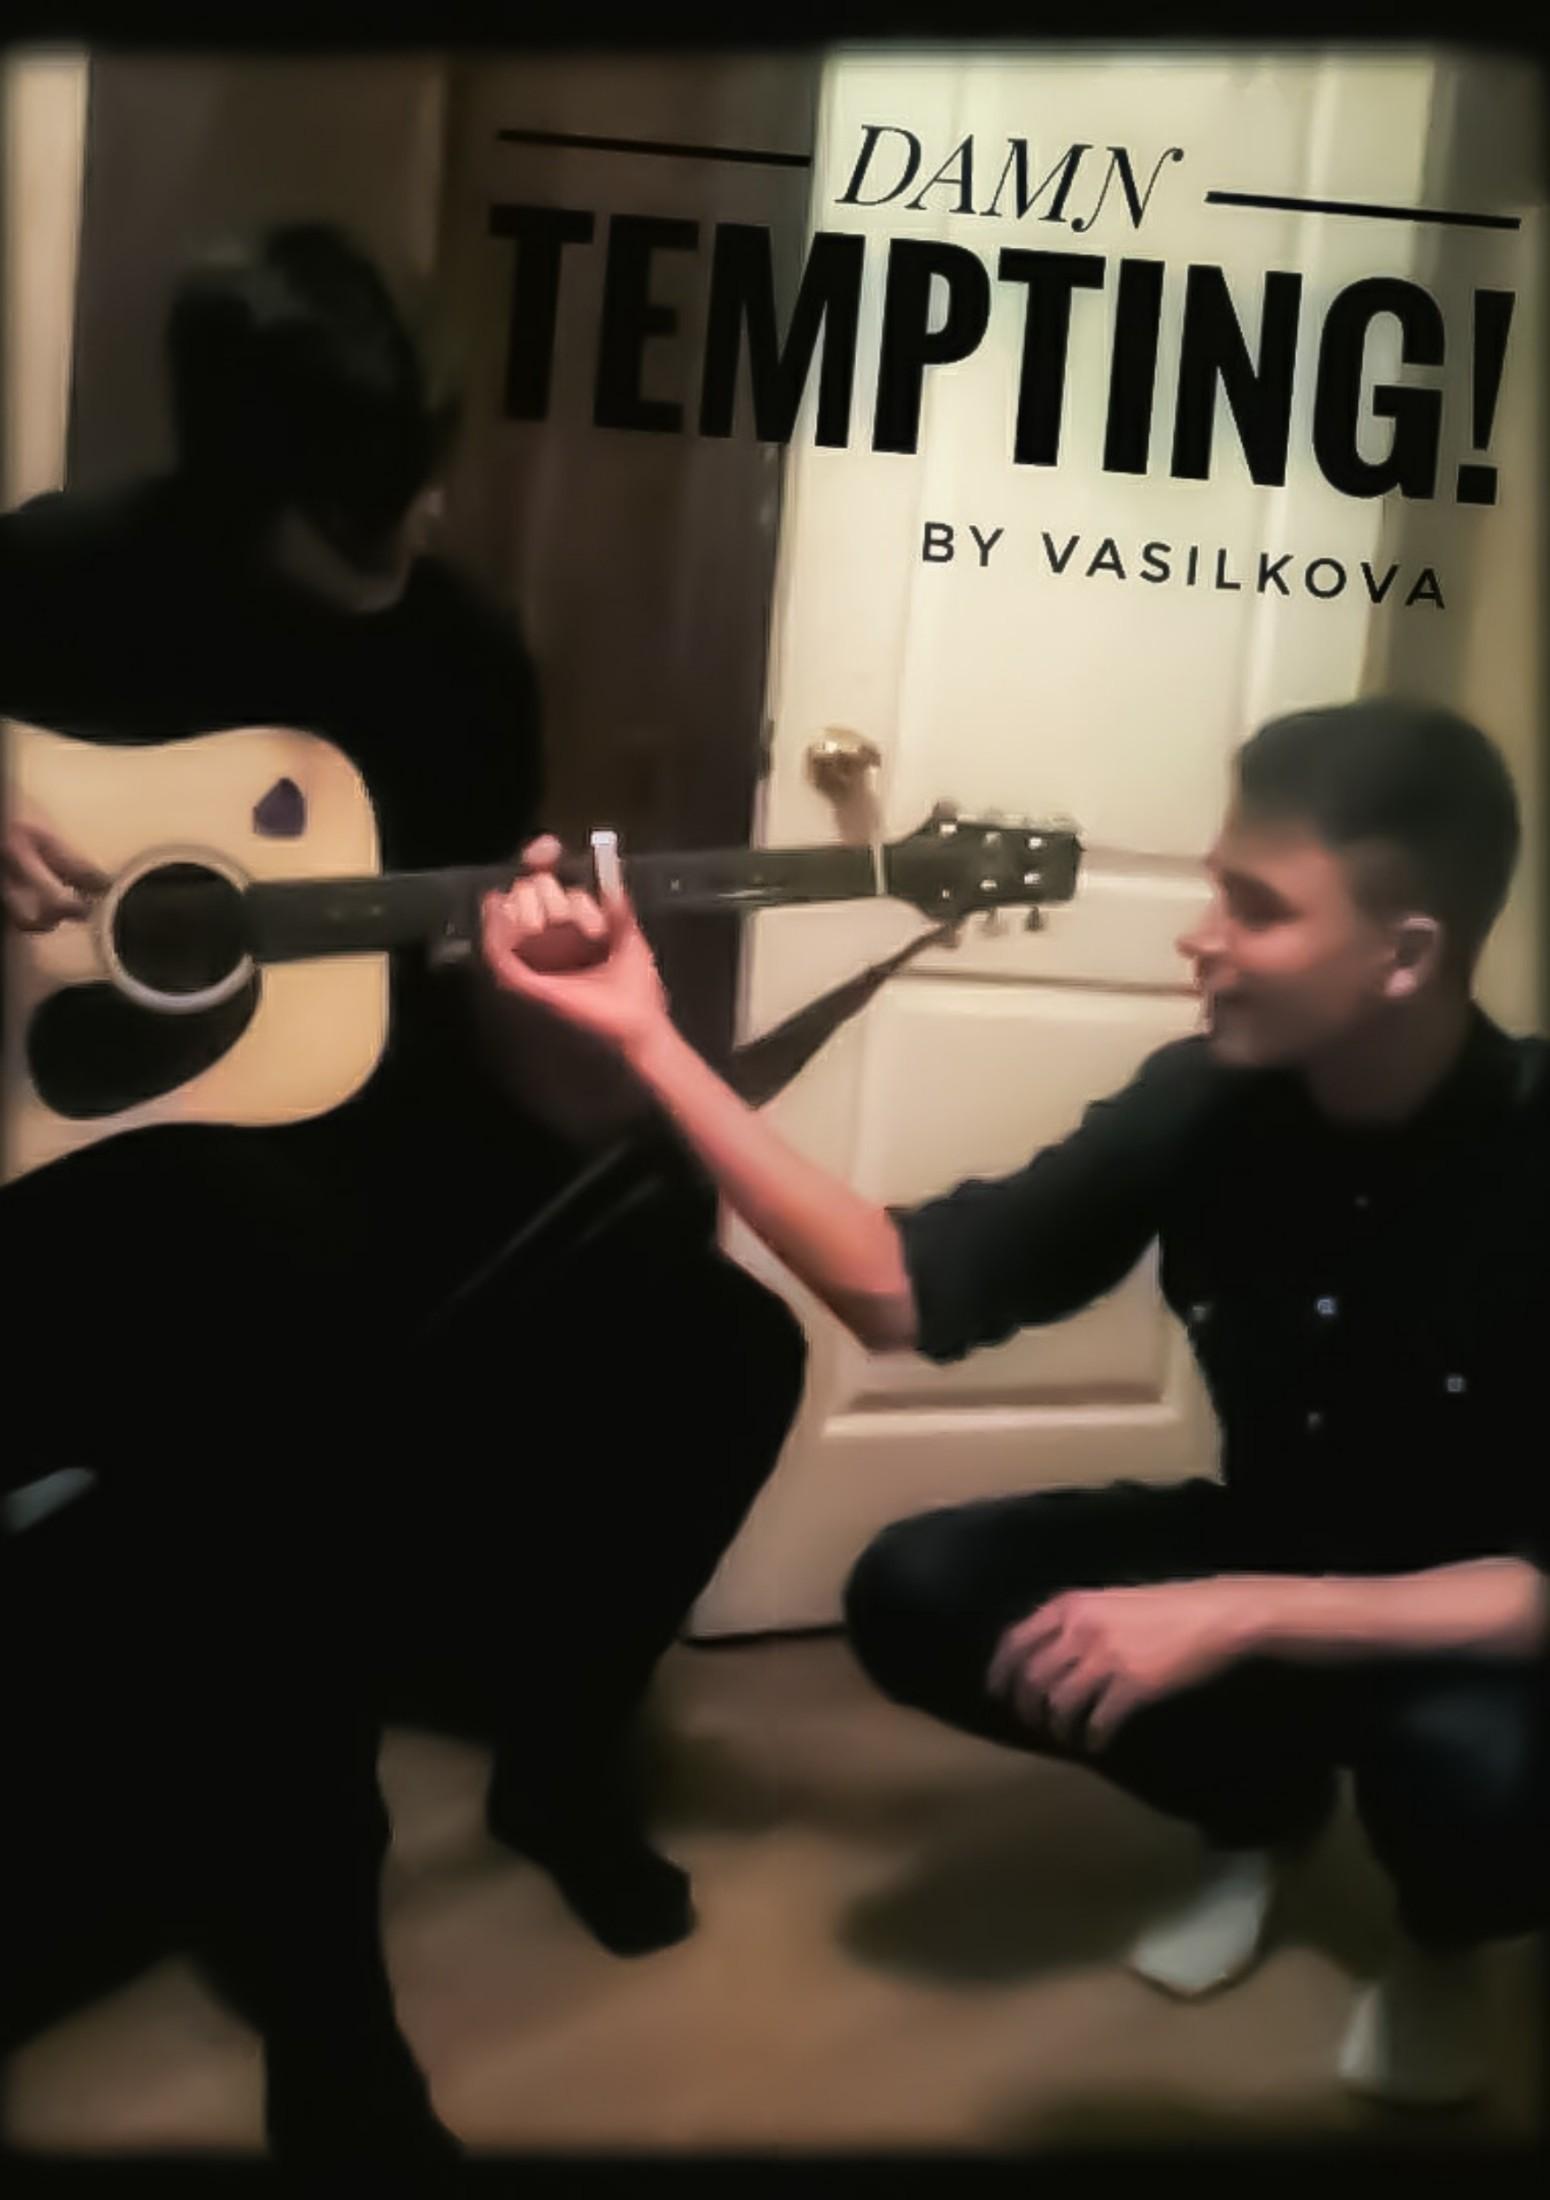 Y. Vasilkova. Damn Tempting!